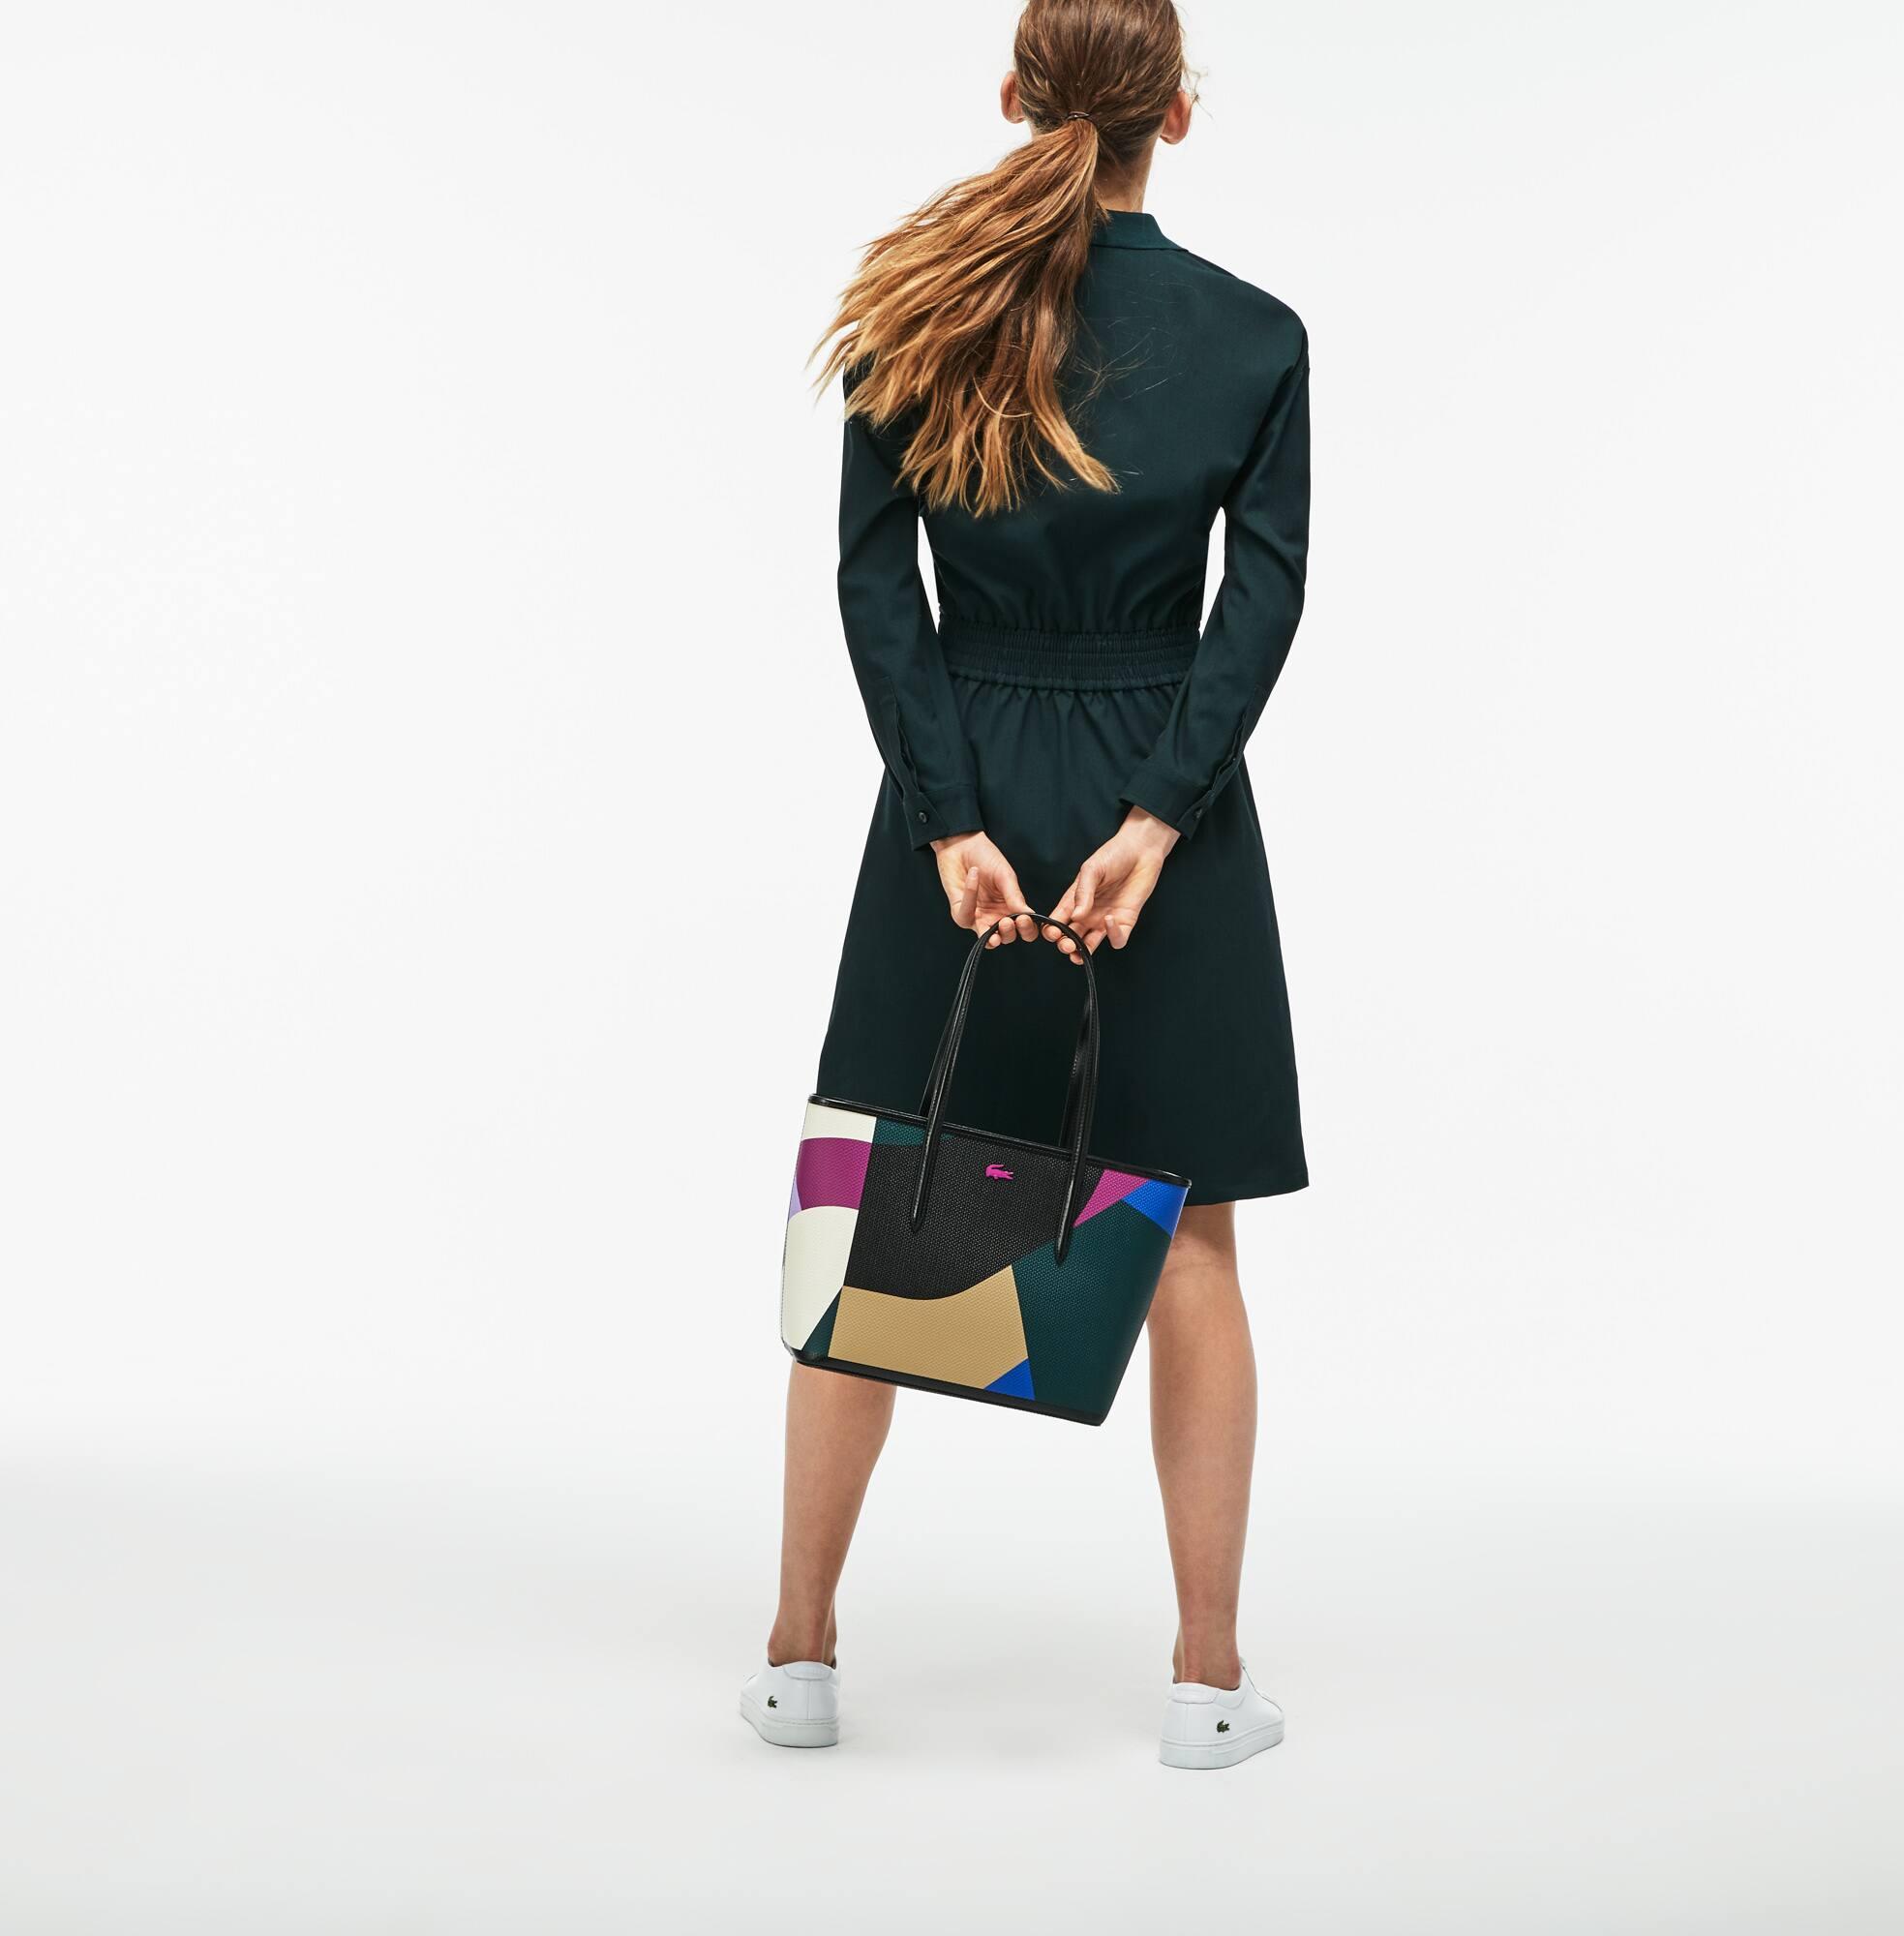 Damen CHANTACO Tote Bag mit Colorblock-Print